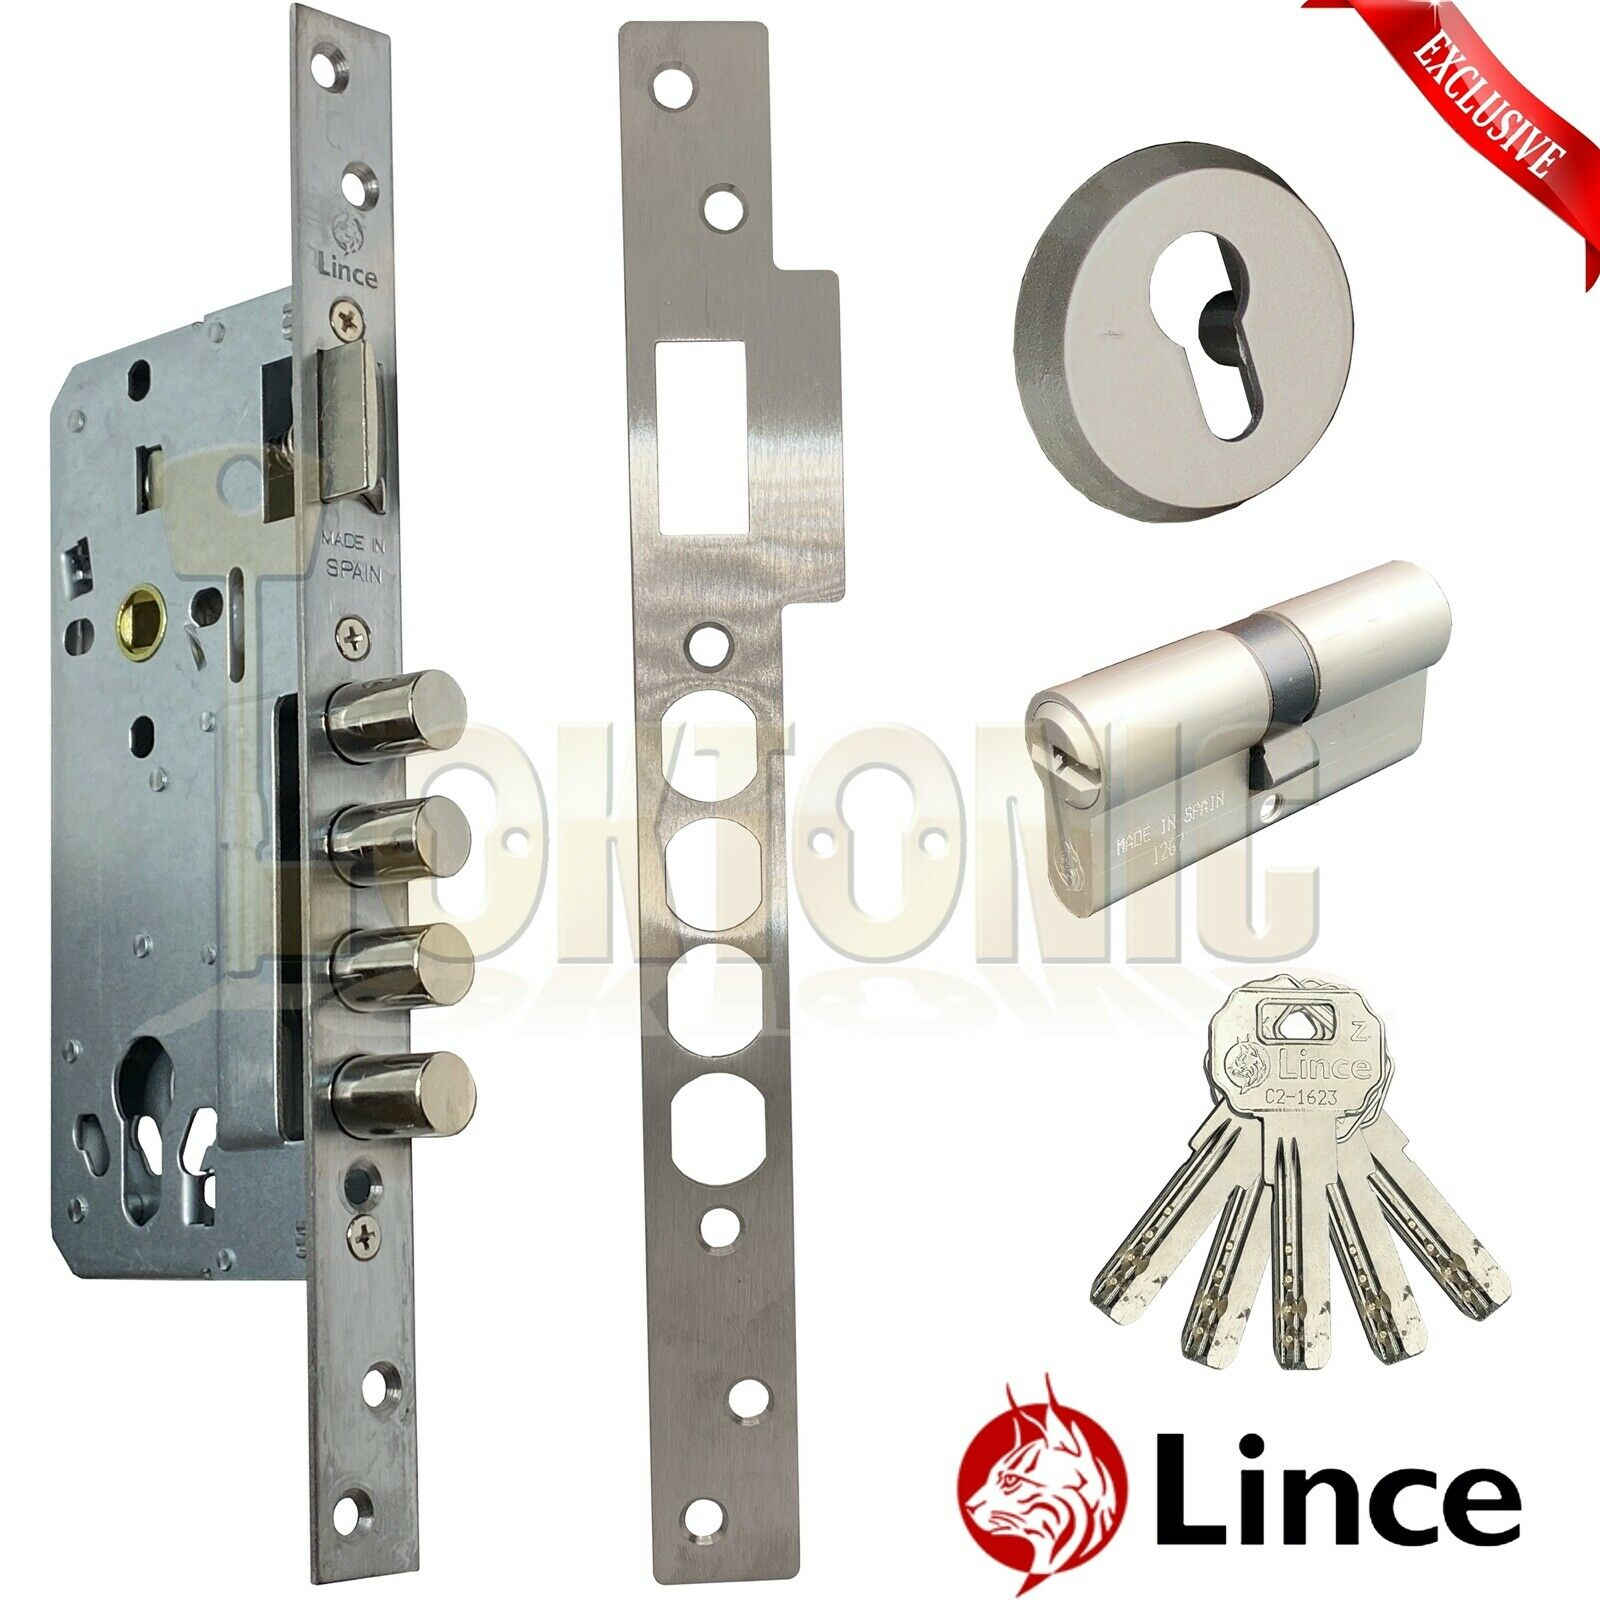 Lince 4 BOLT High Security Mortice Euro Sash Bolt Lock Case 5 Secure Dimple Keys